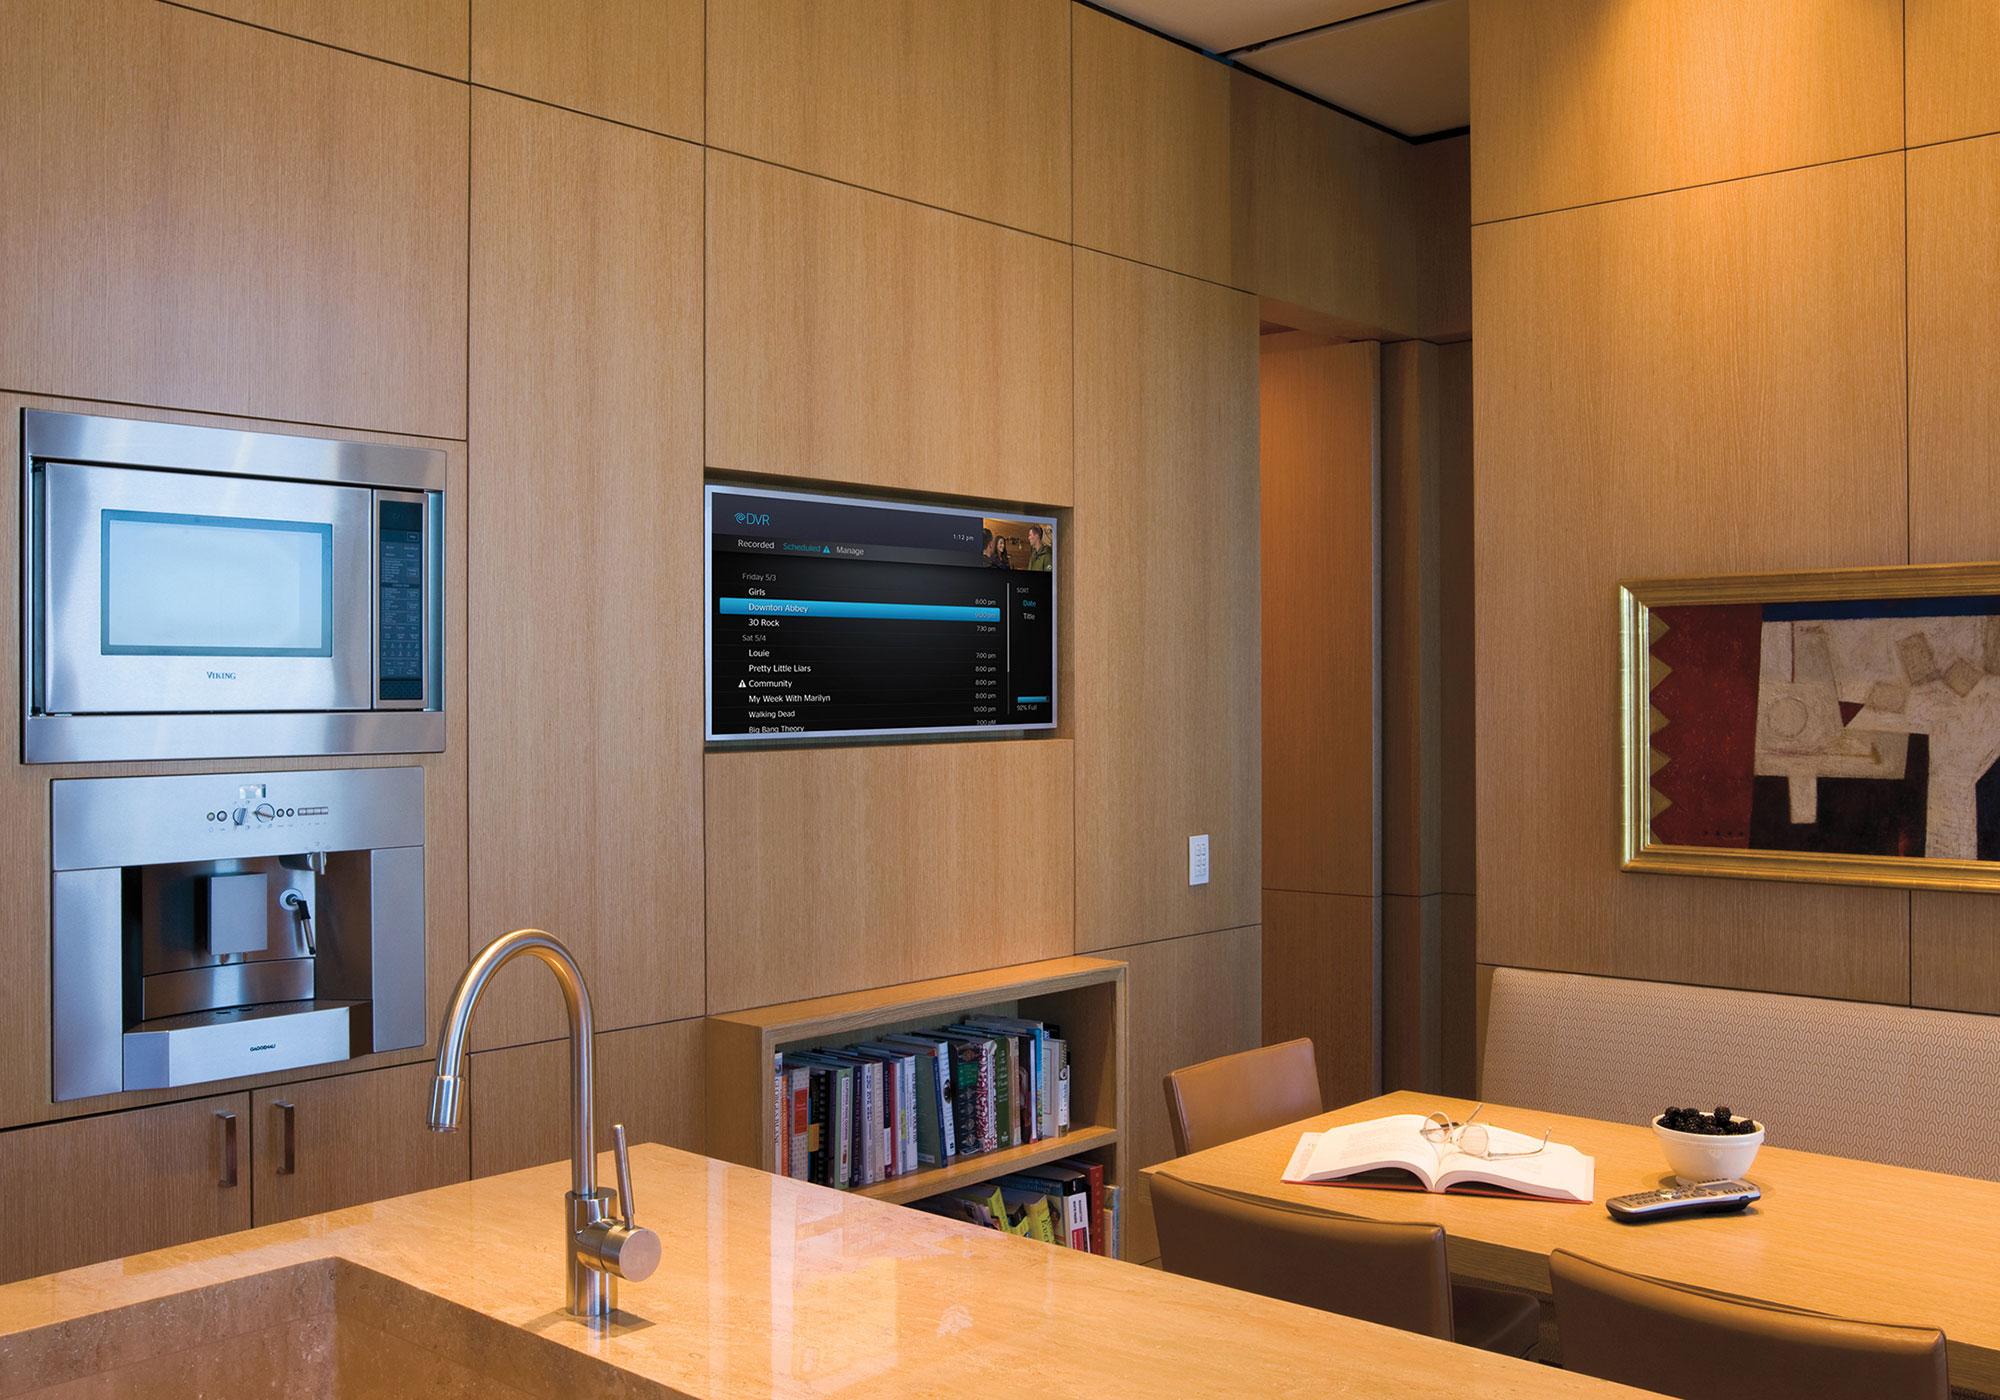 kitchen, tv, recess, cabinetry, millwork, handheld remote